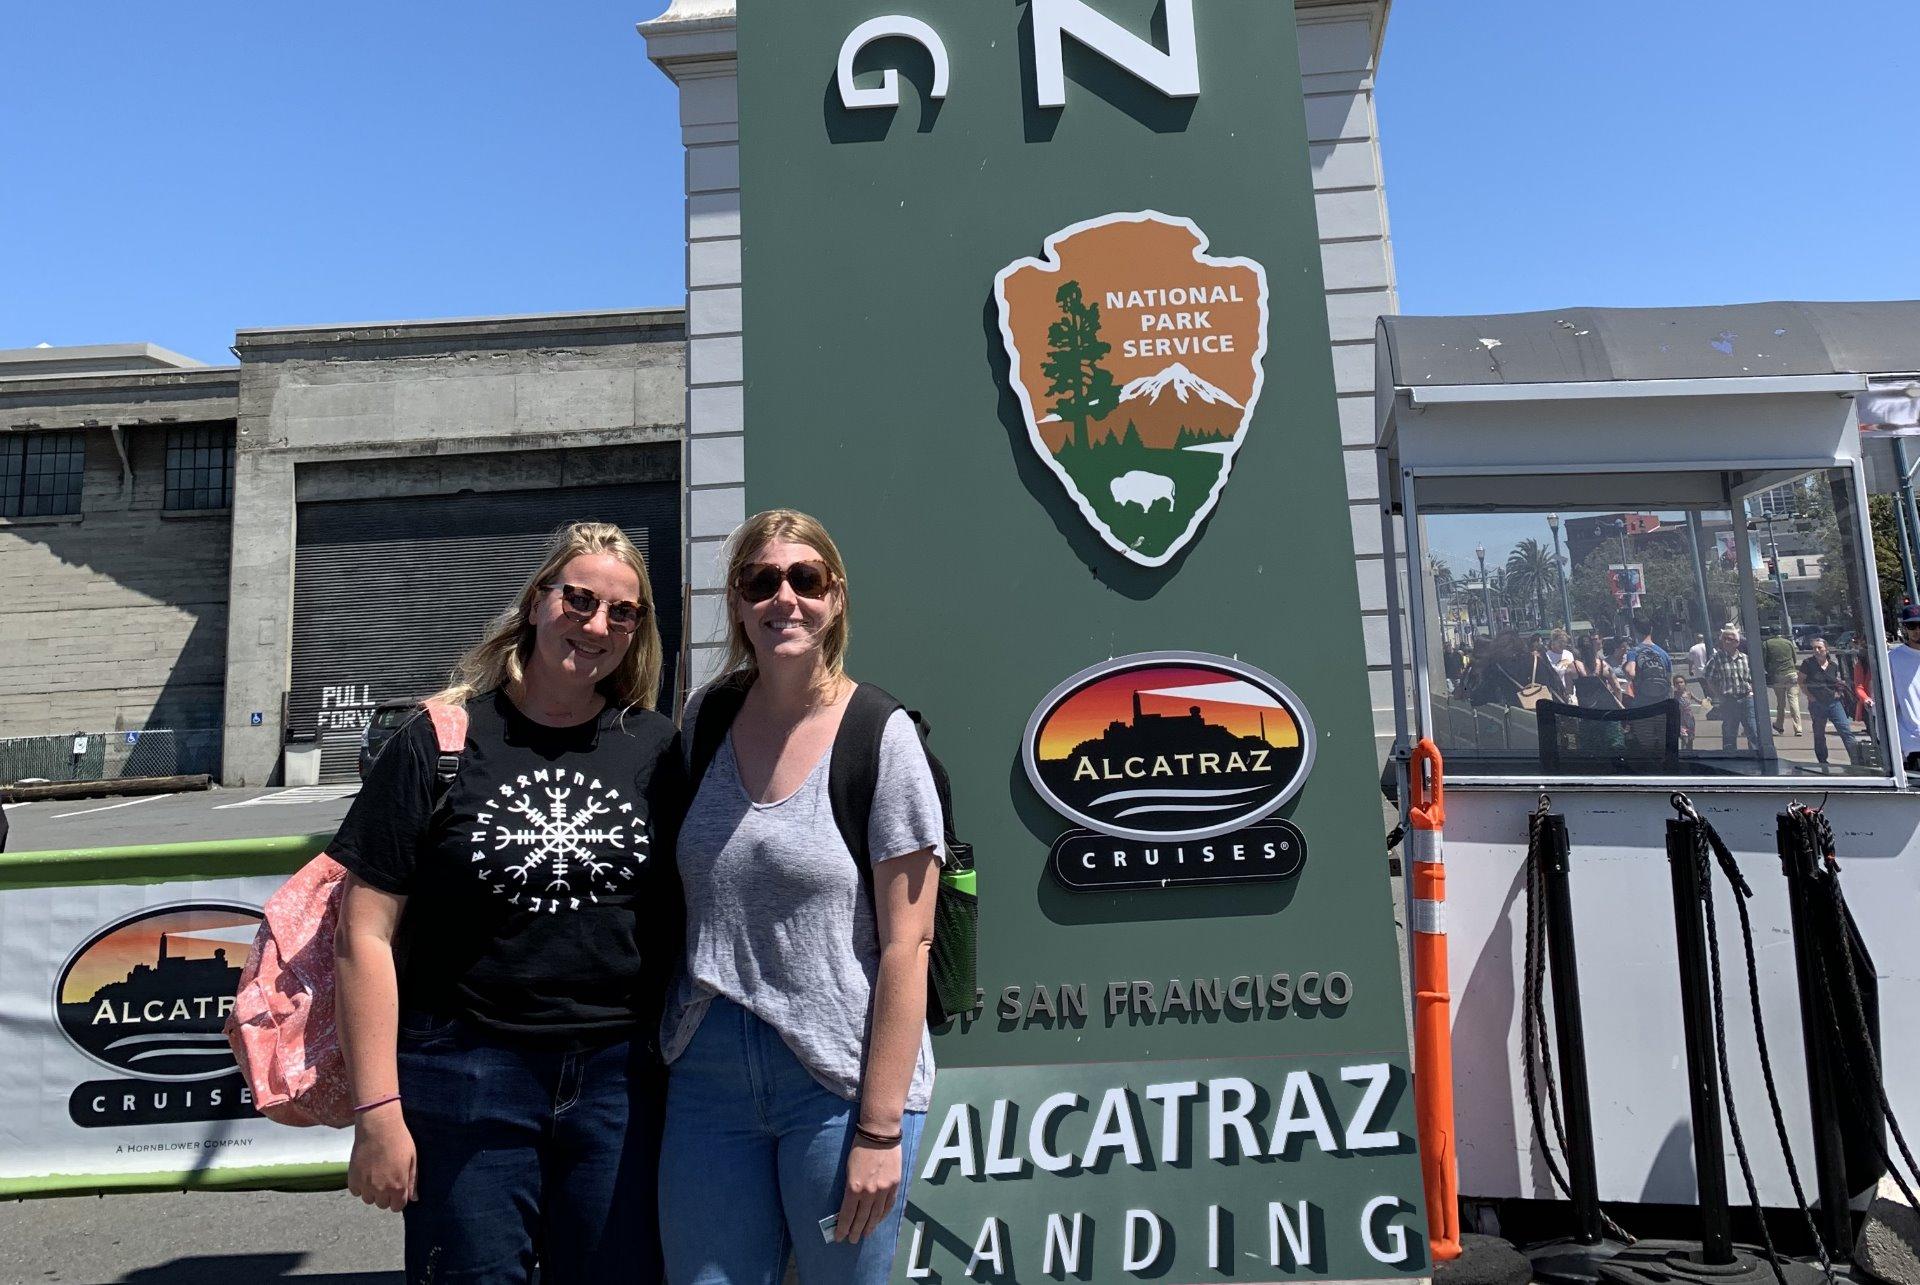 alcatraz-ferry-landing-ticket-booth